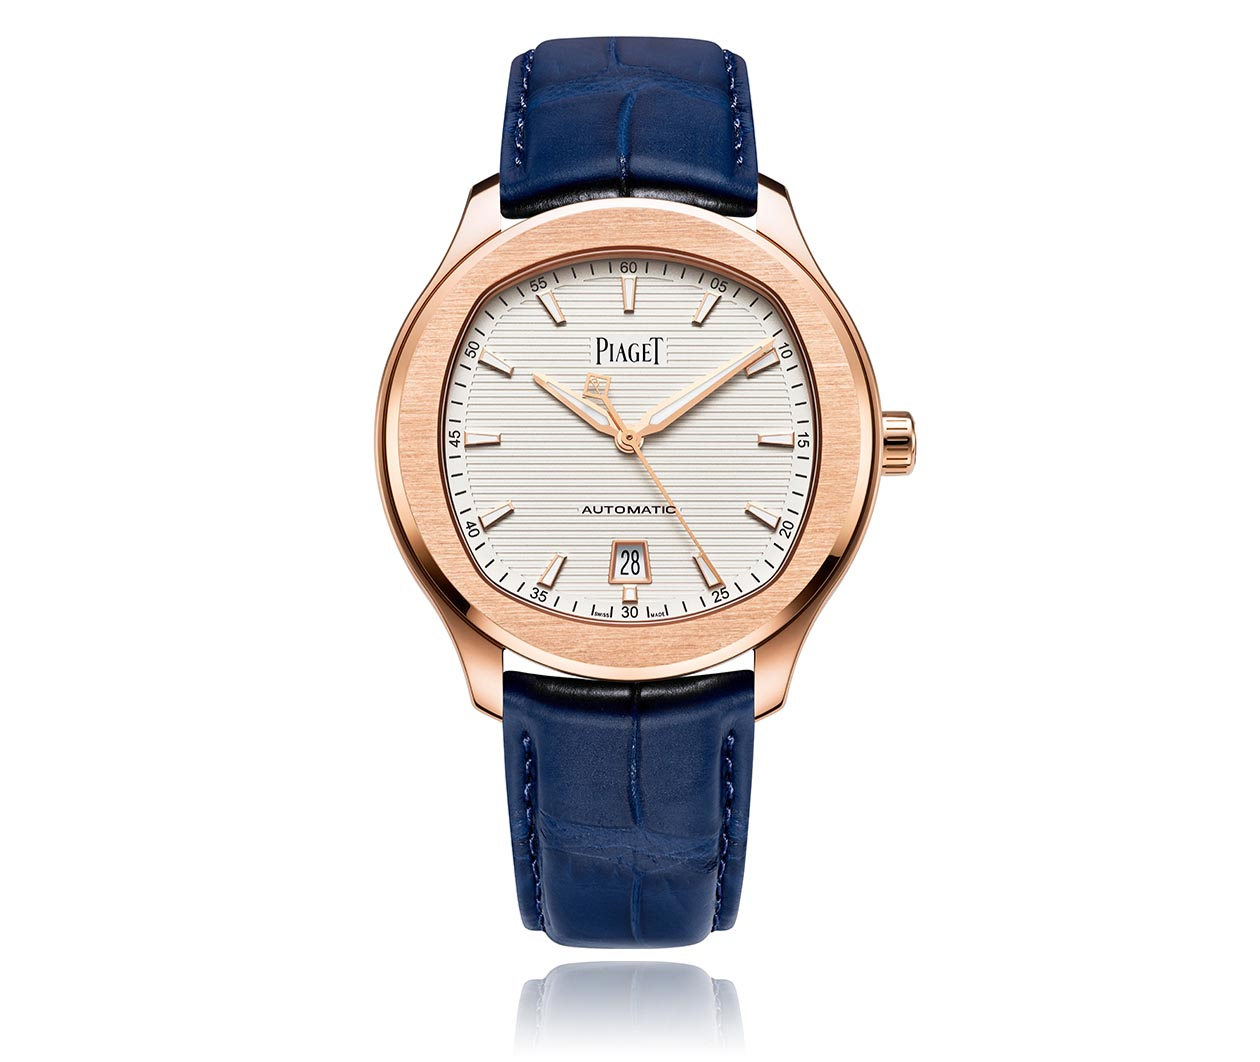 Piaget Polo watch G0A43010 Flatlay FINAL